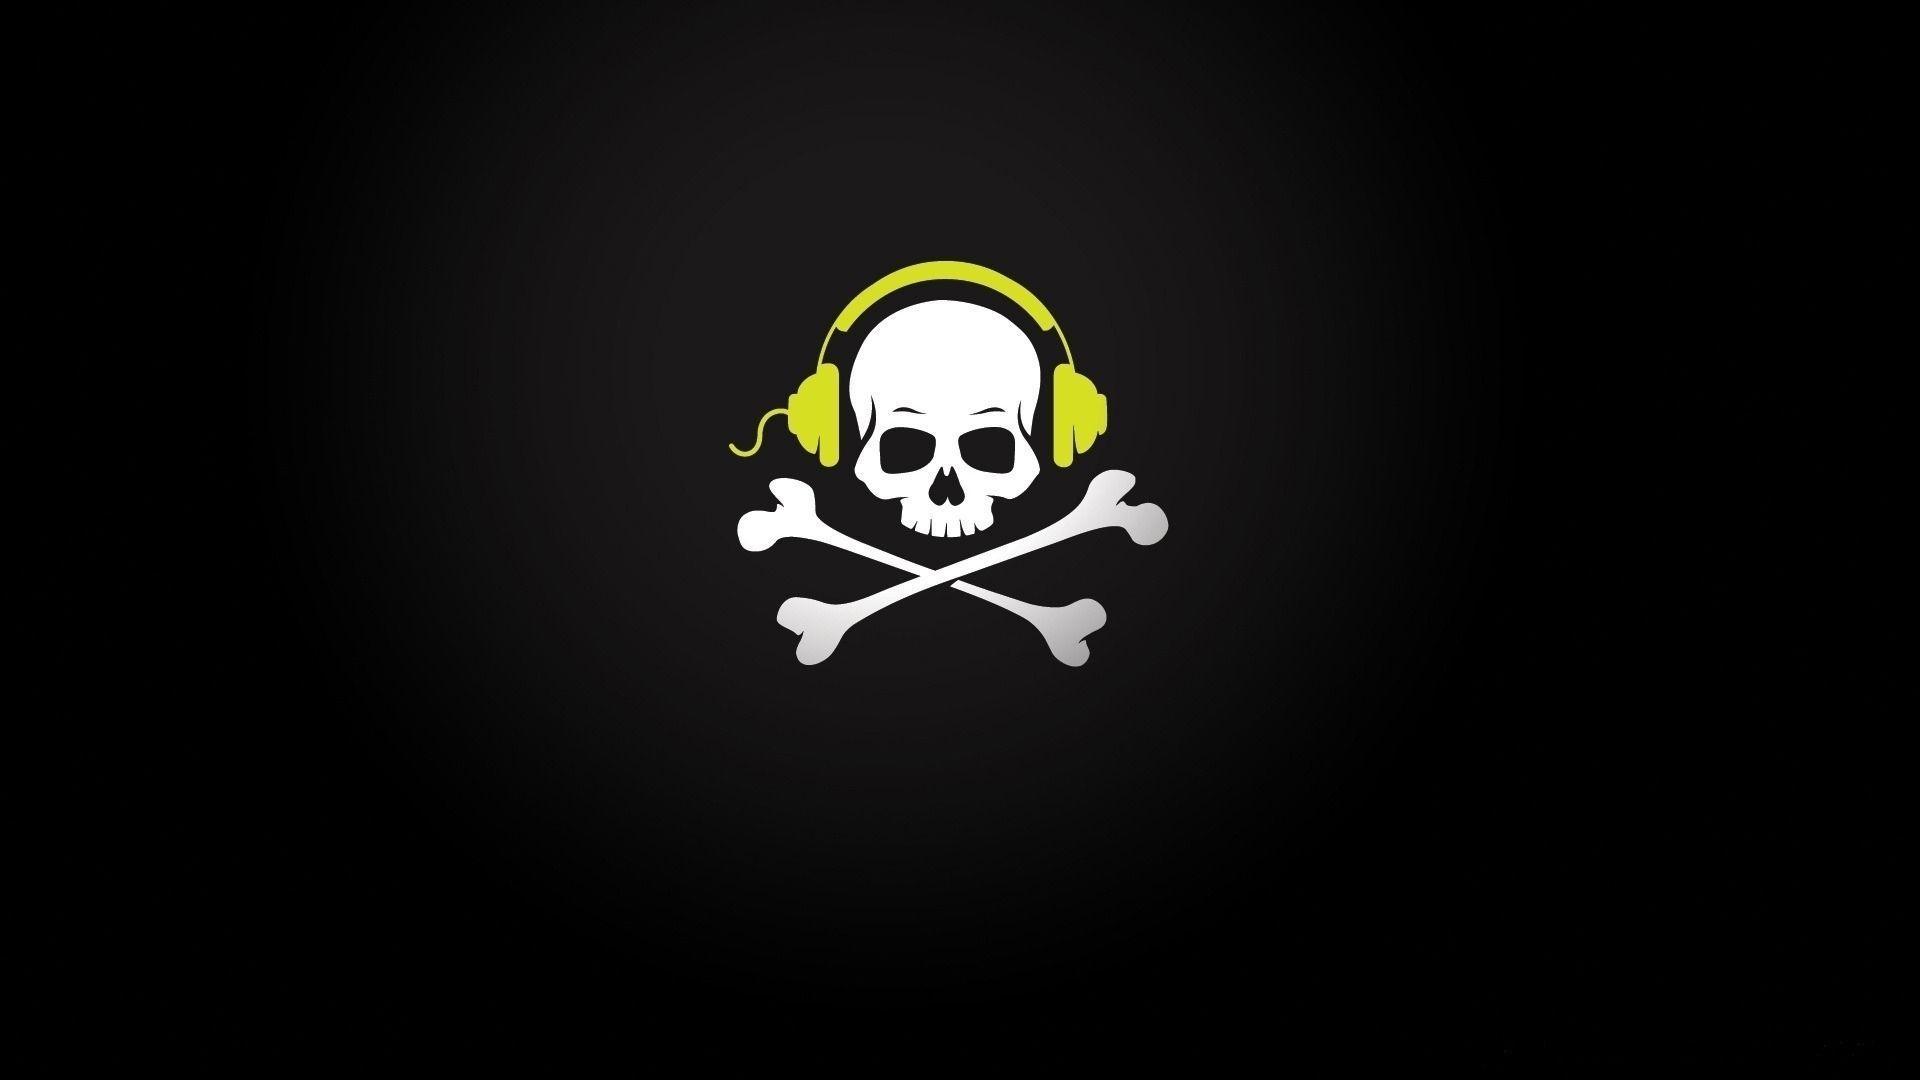 wallpaper skull bones pirate - photo #22